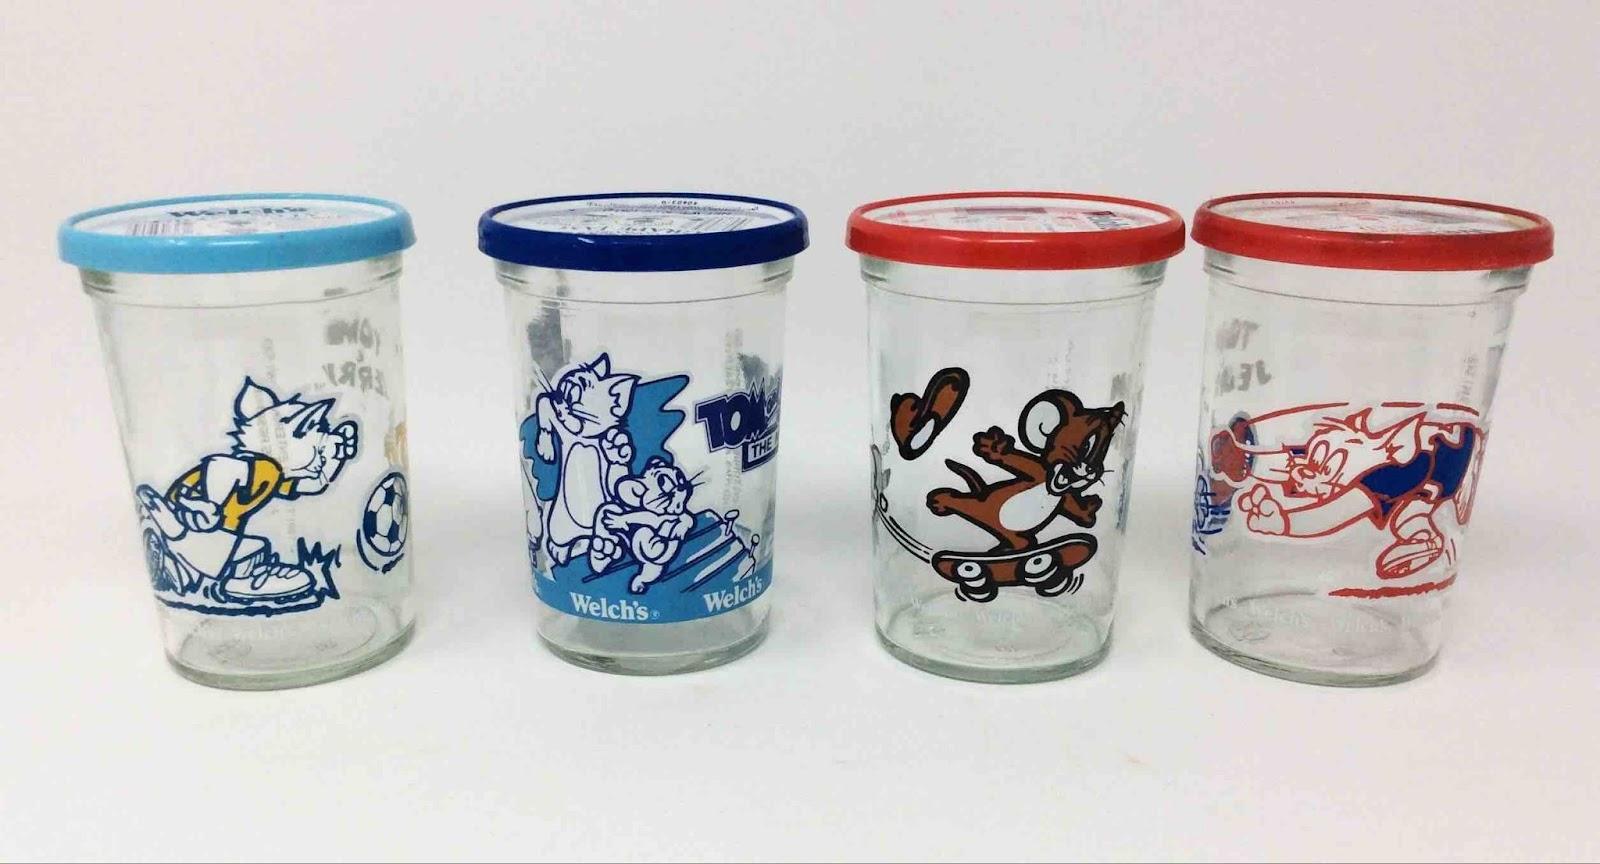 Vintage Tom & Jerry jelly jars